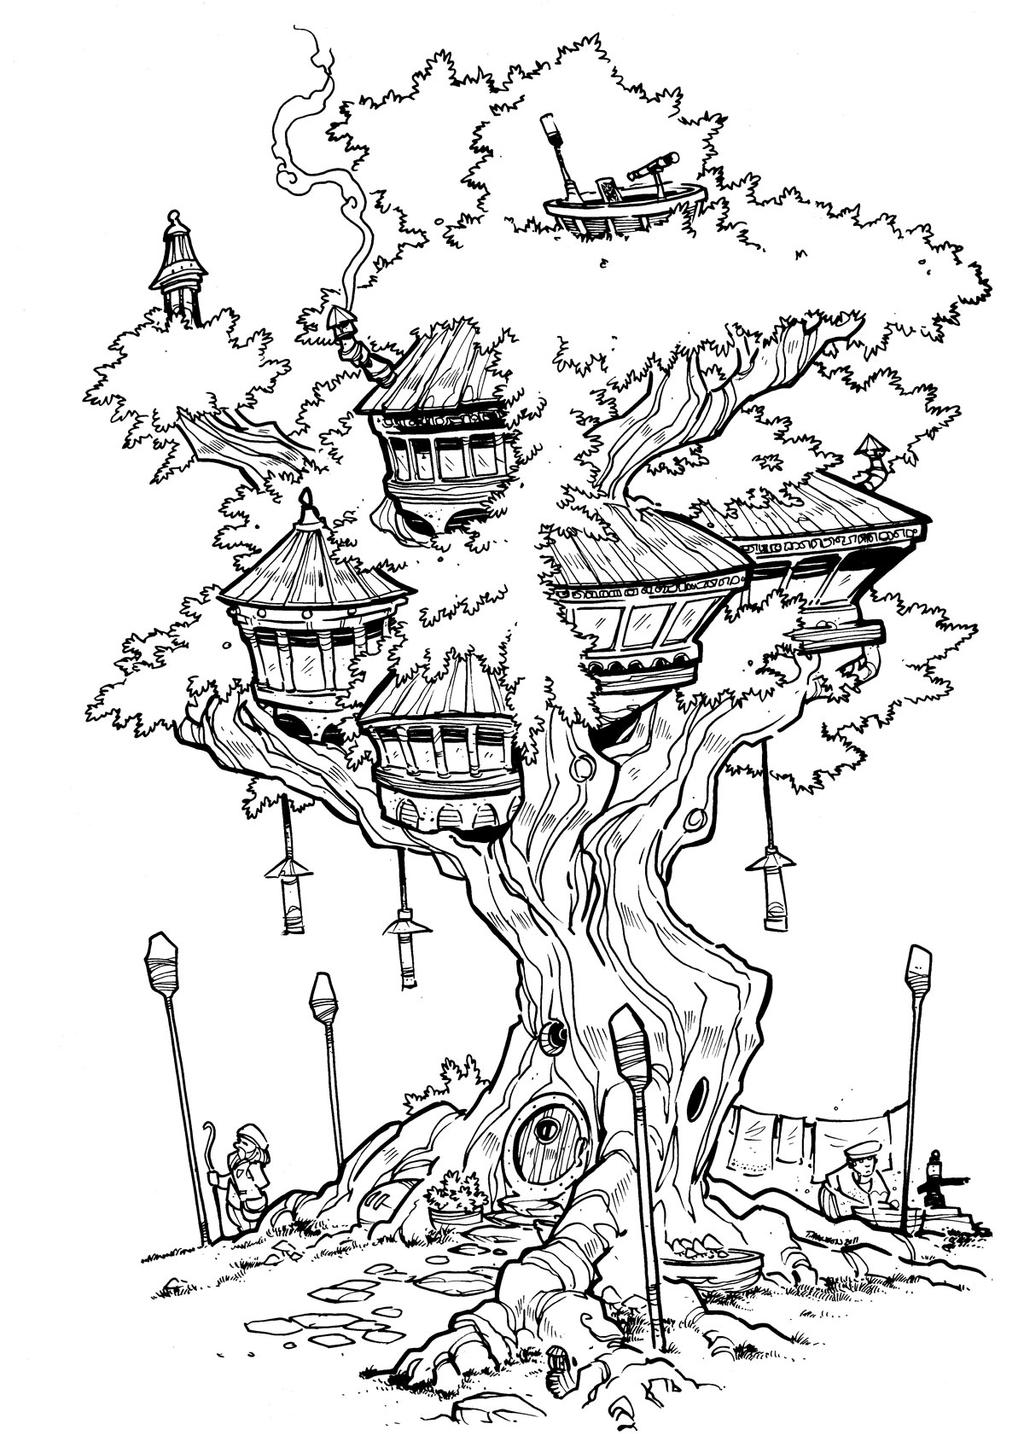 the treehouse inks by travisJhanson on DeviantArt